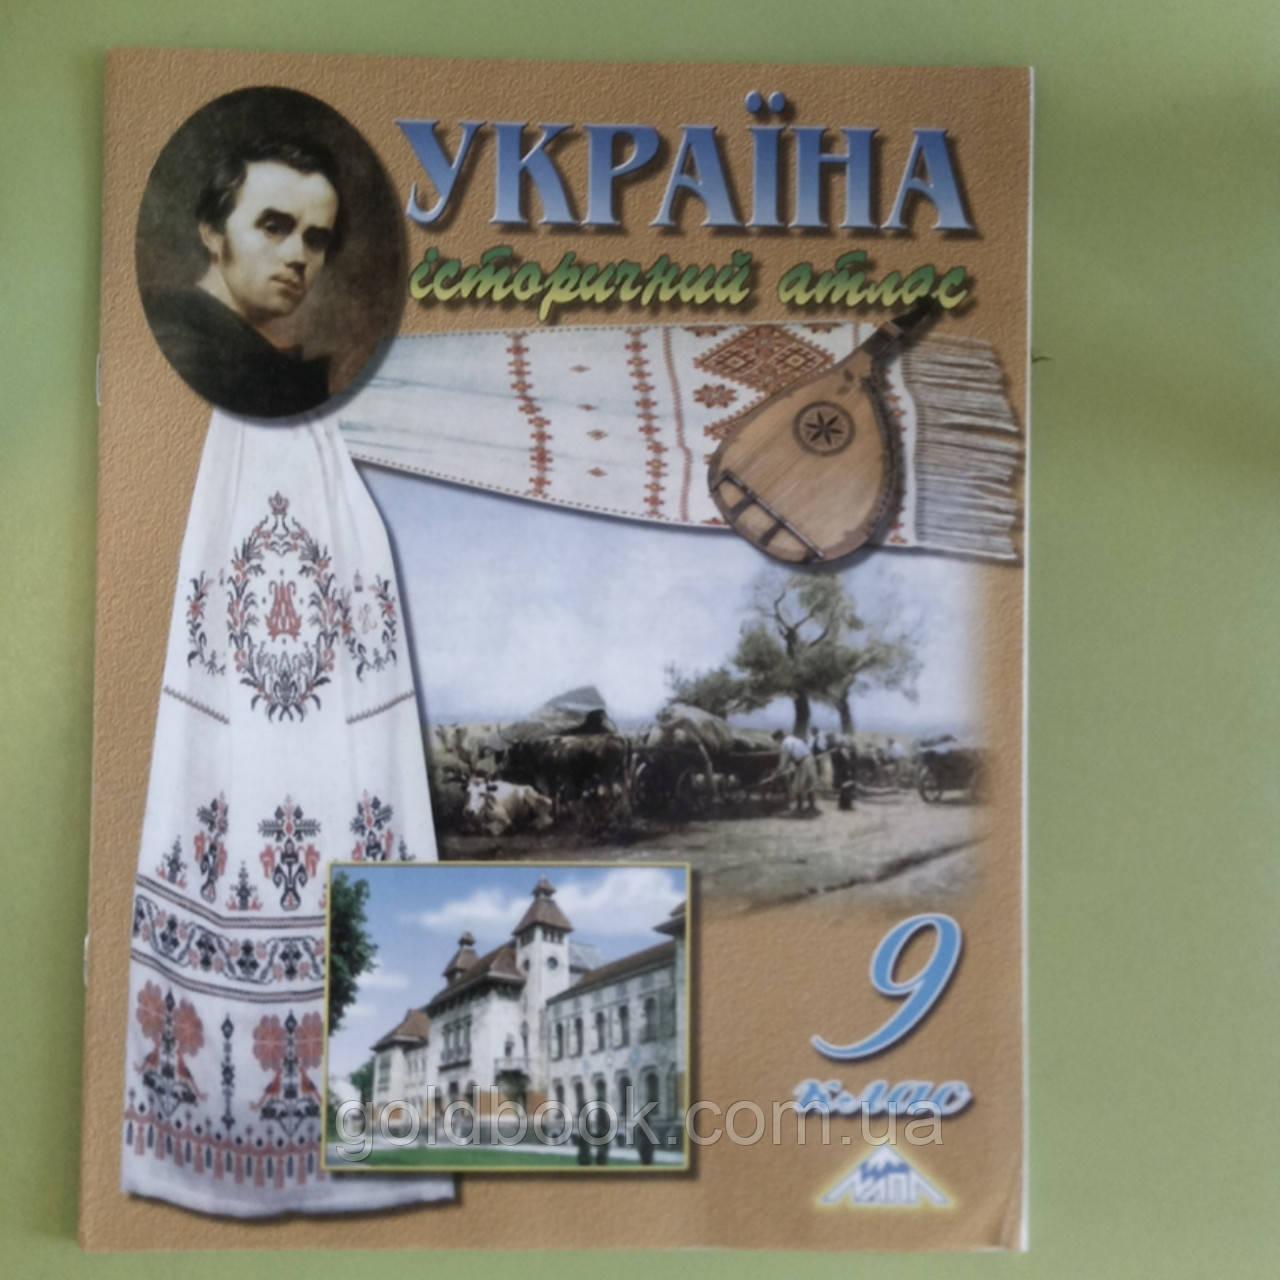 Україна історичний атлас 9 клас МАПА